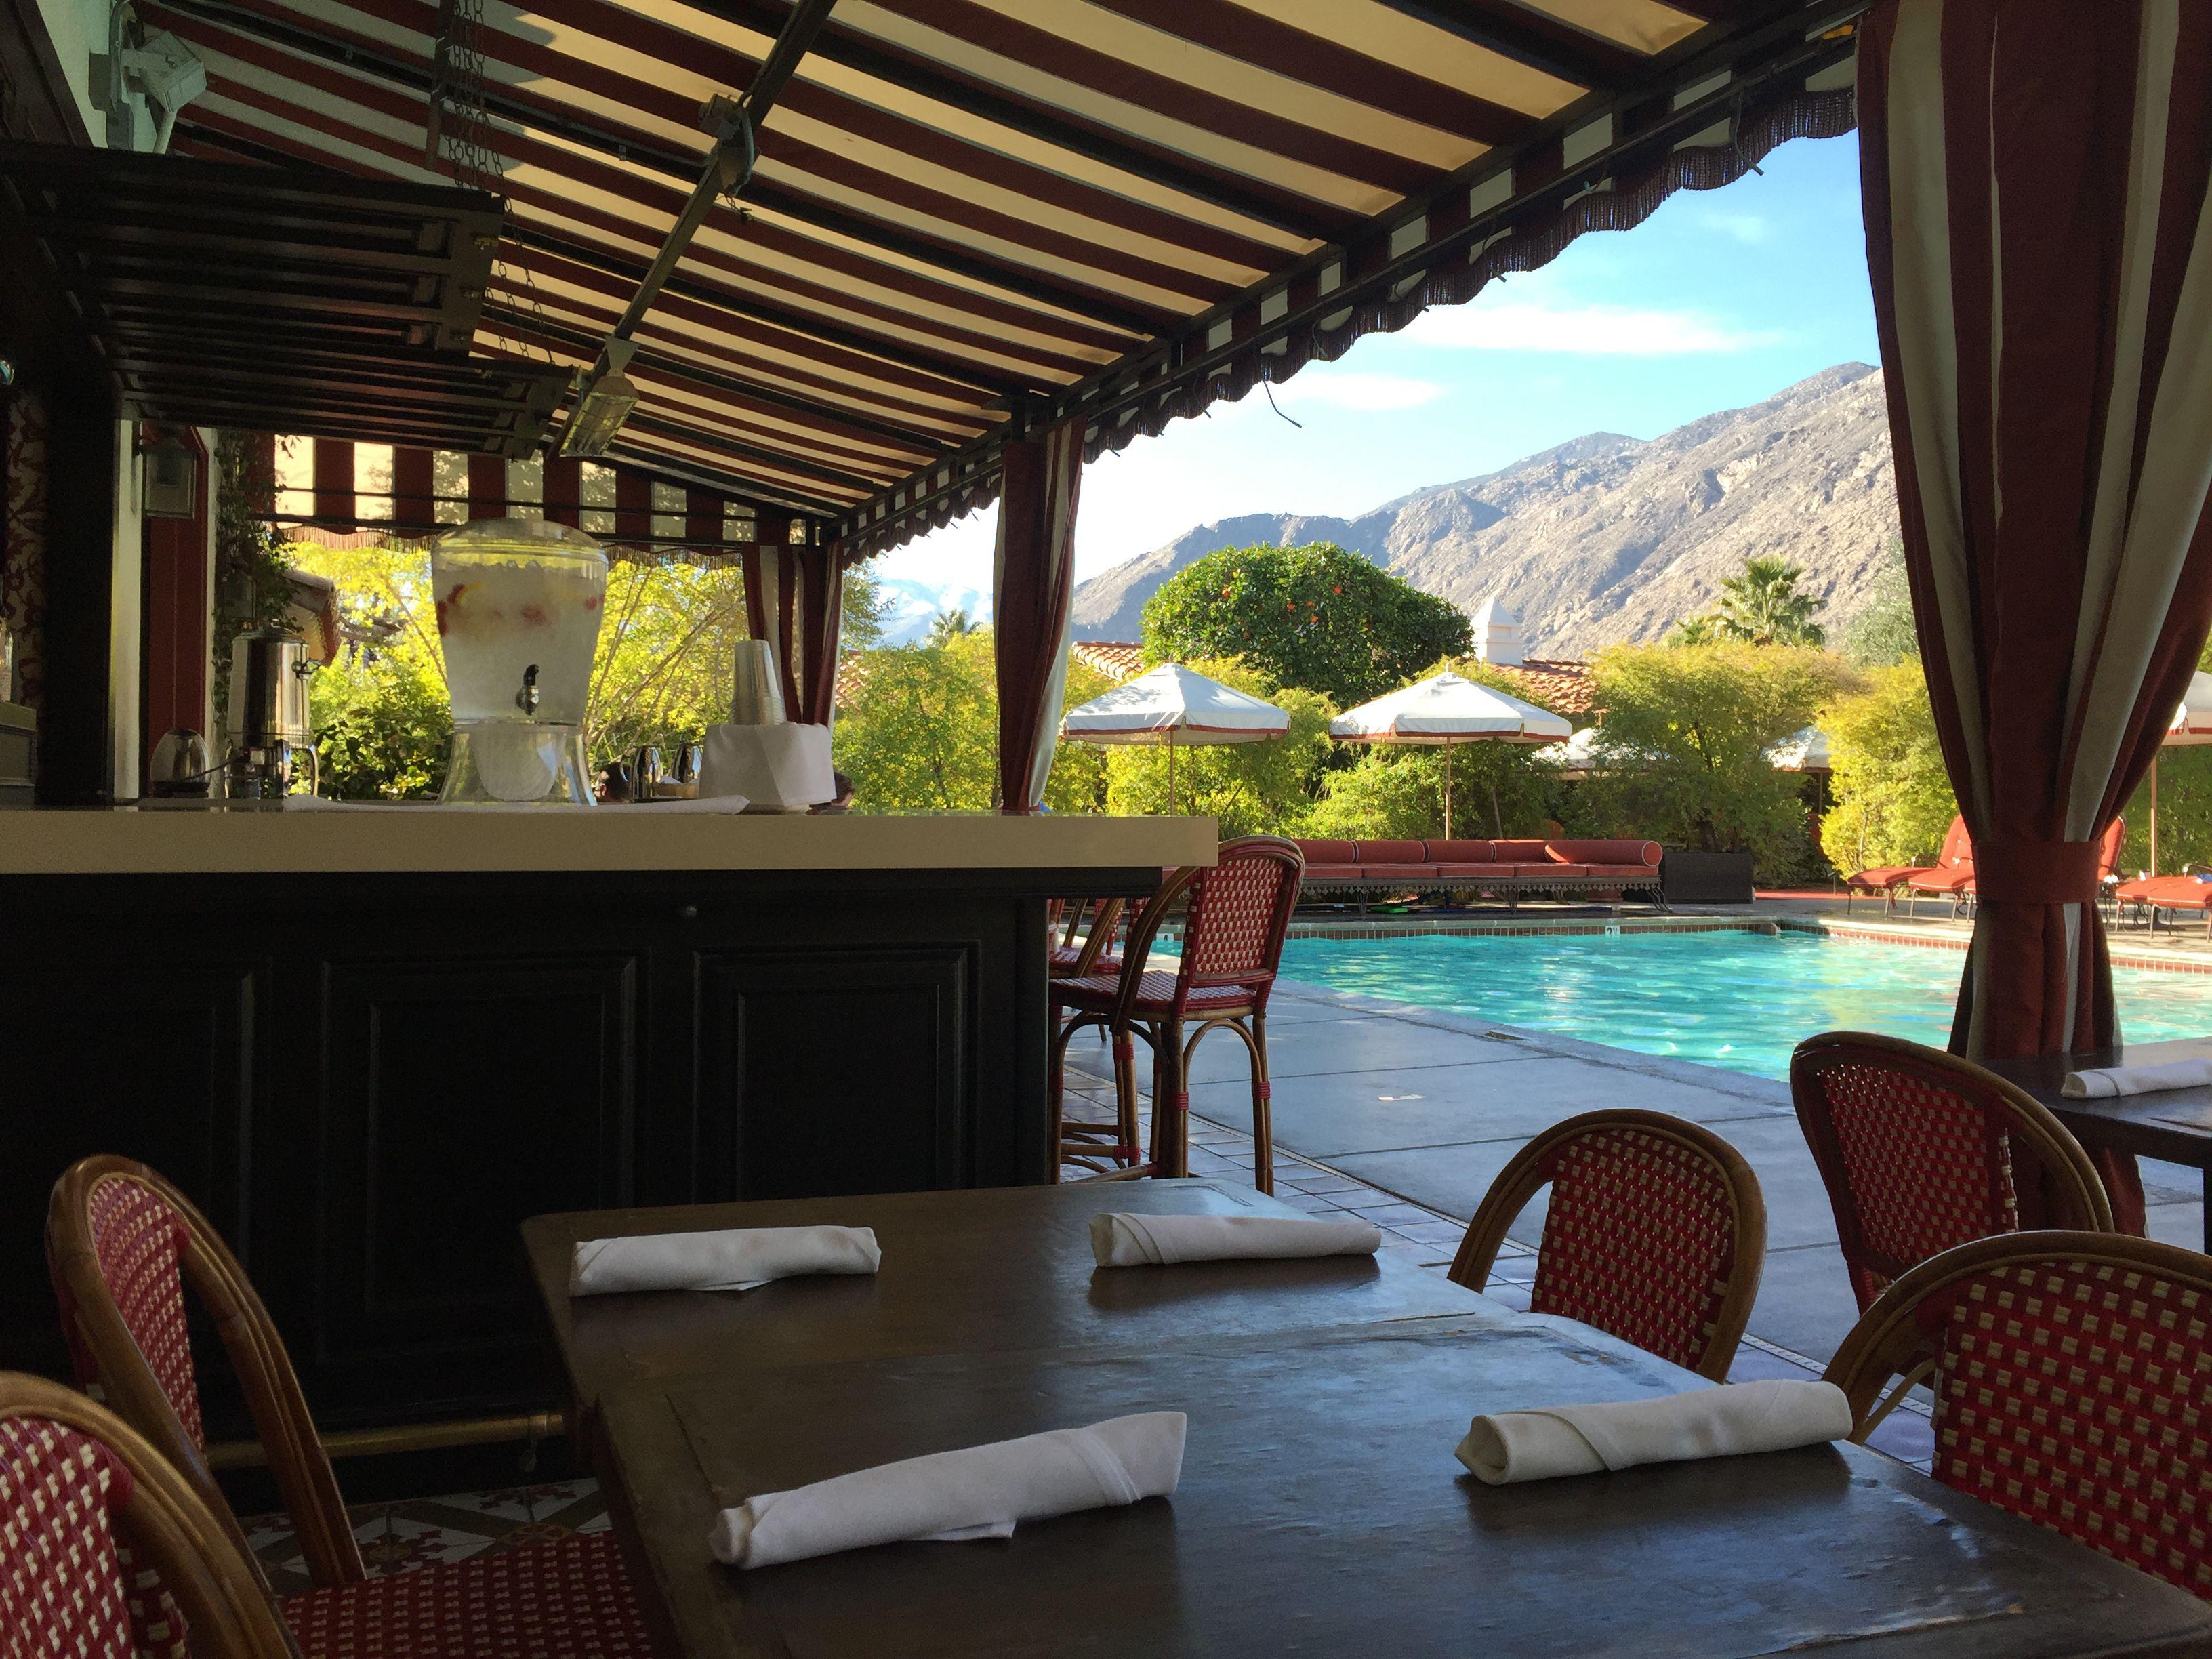 Colony Palms Hotel pool